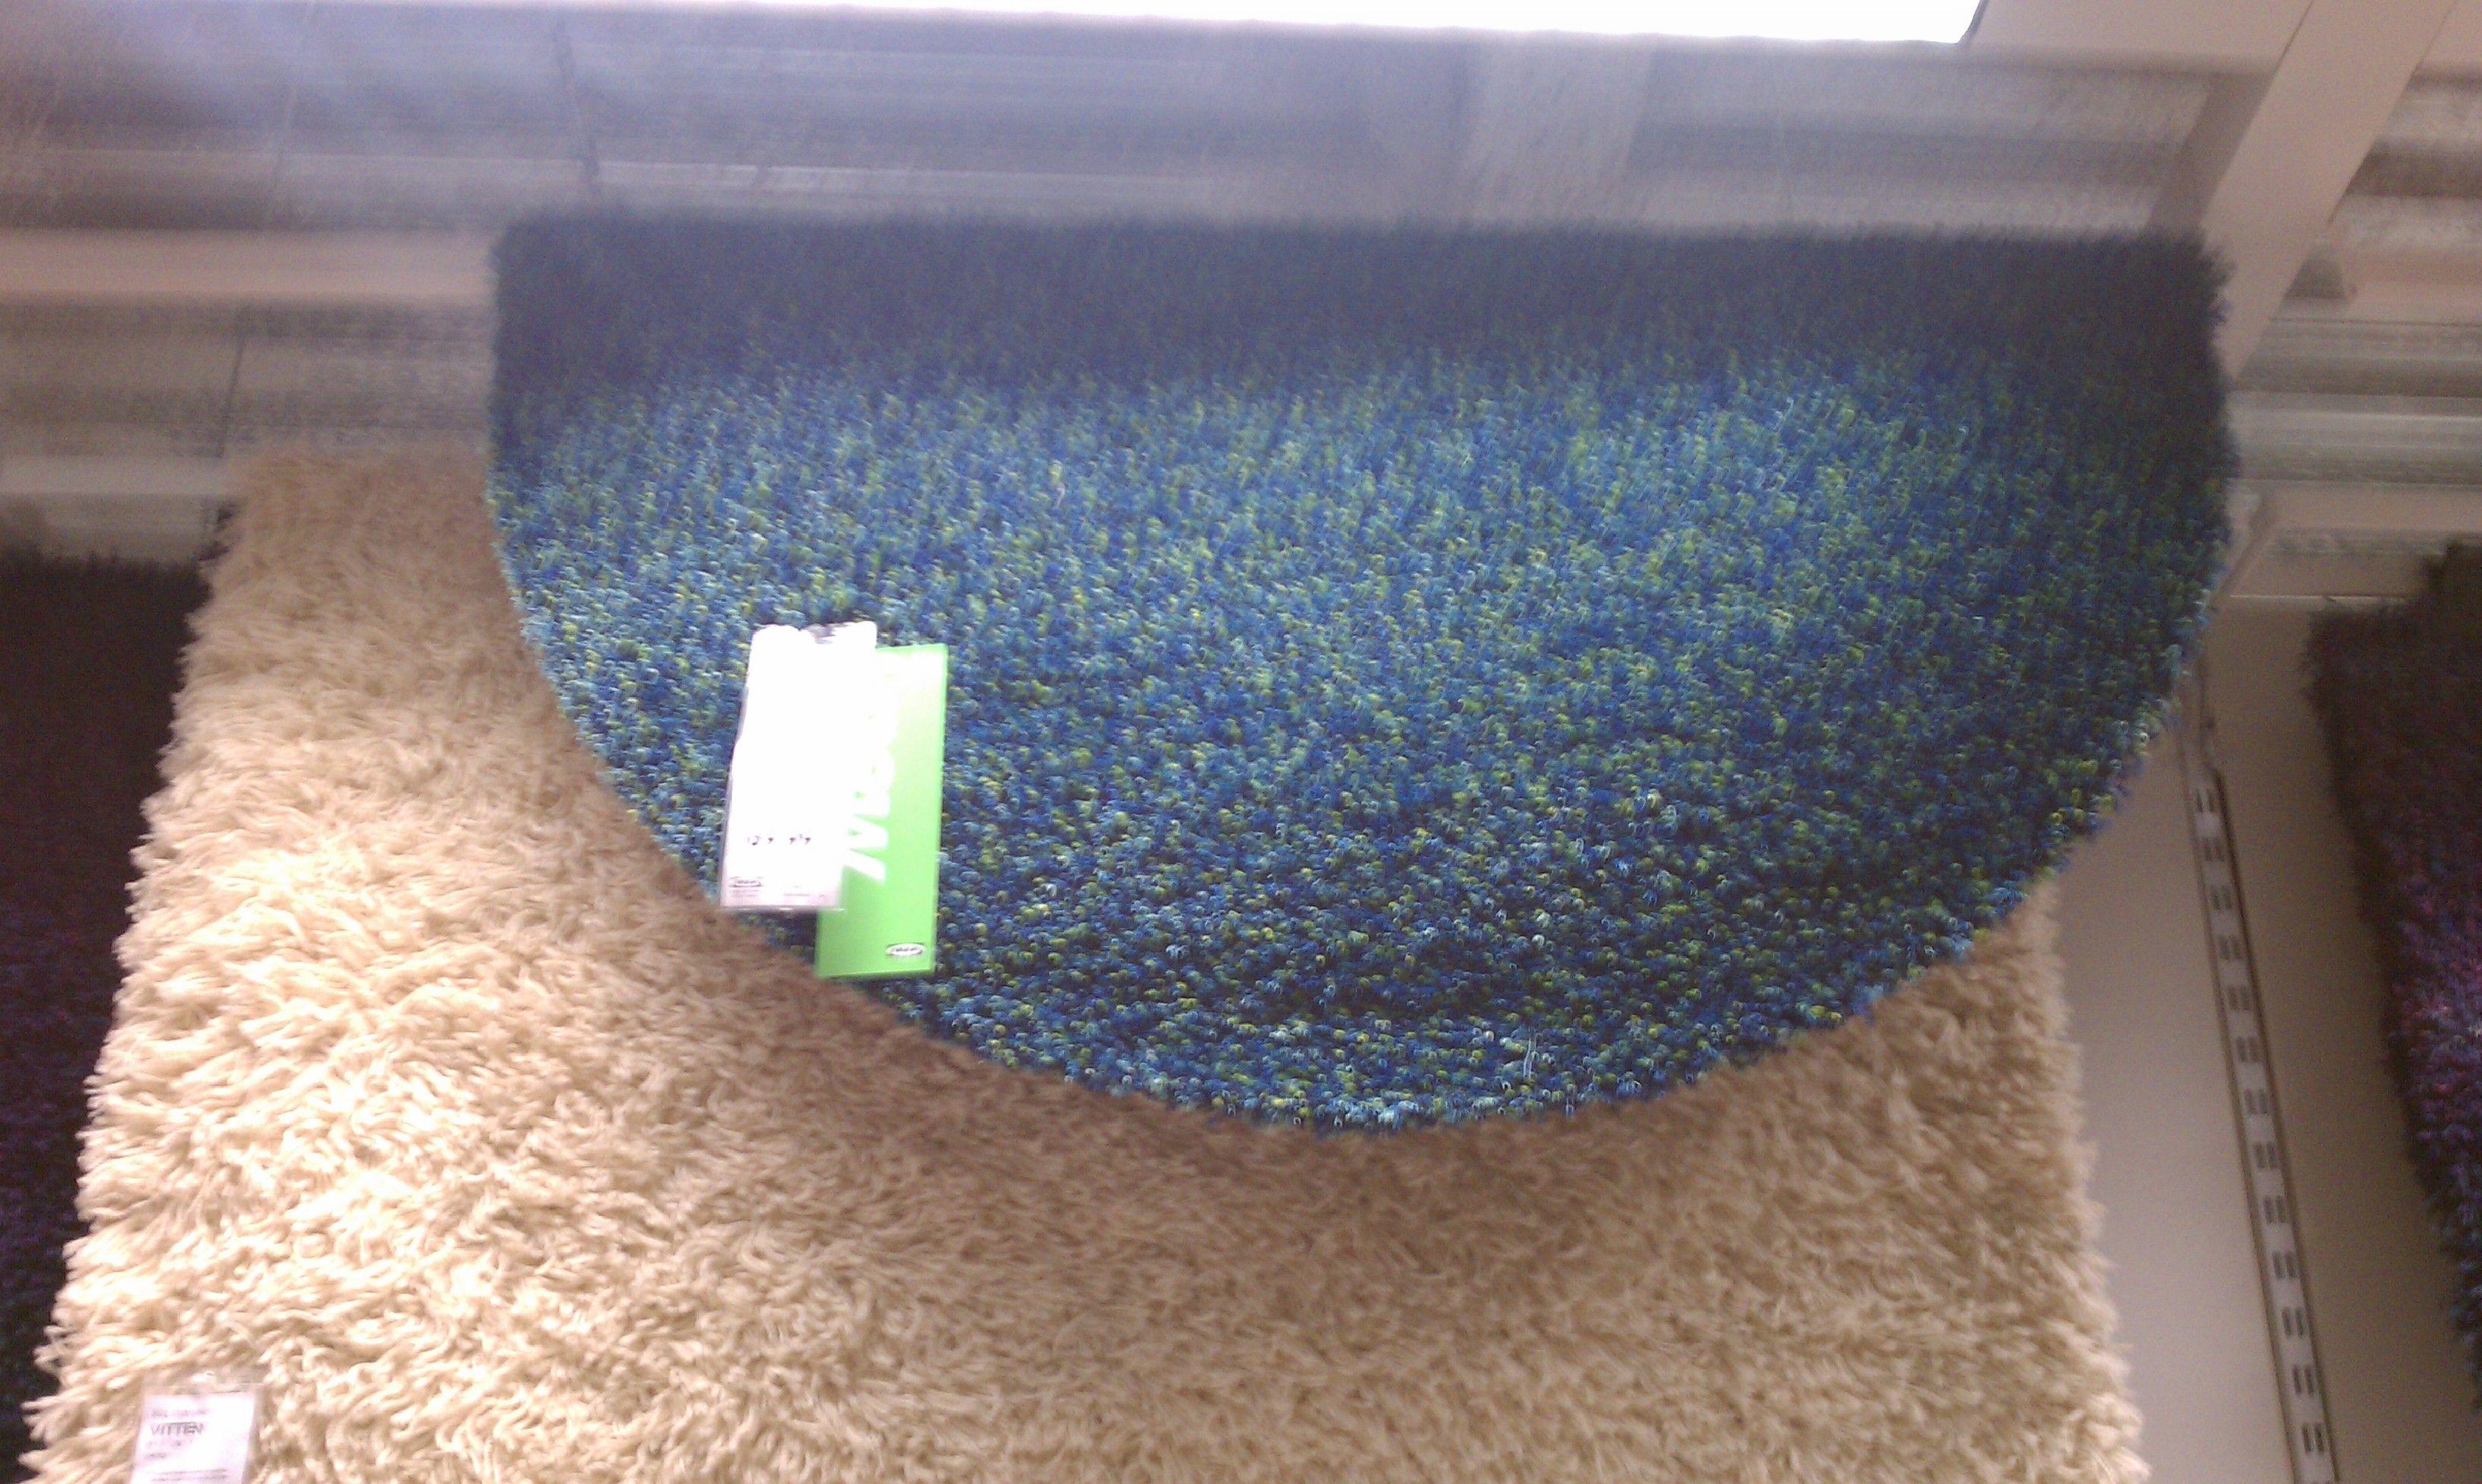 70 Balum Round Rug Ikea Round Rugs Rugs Decor